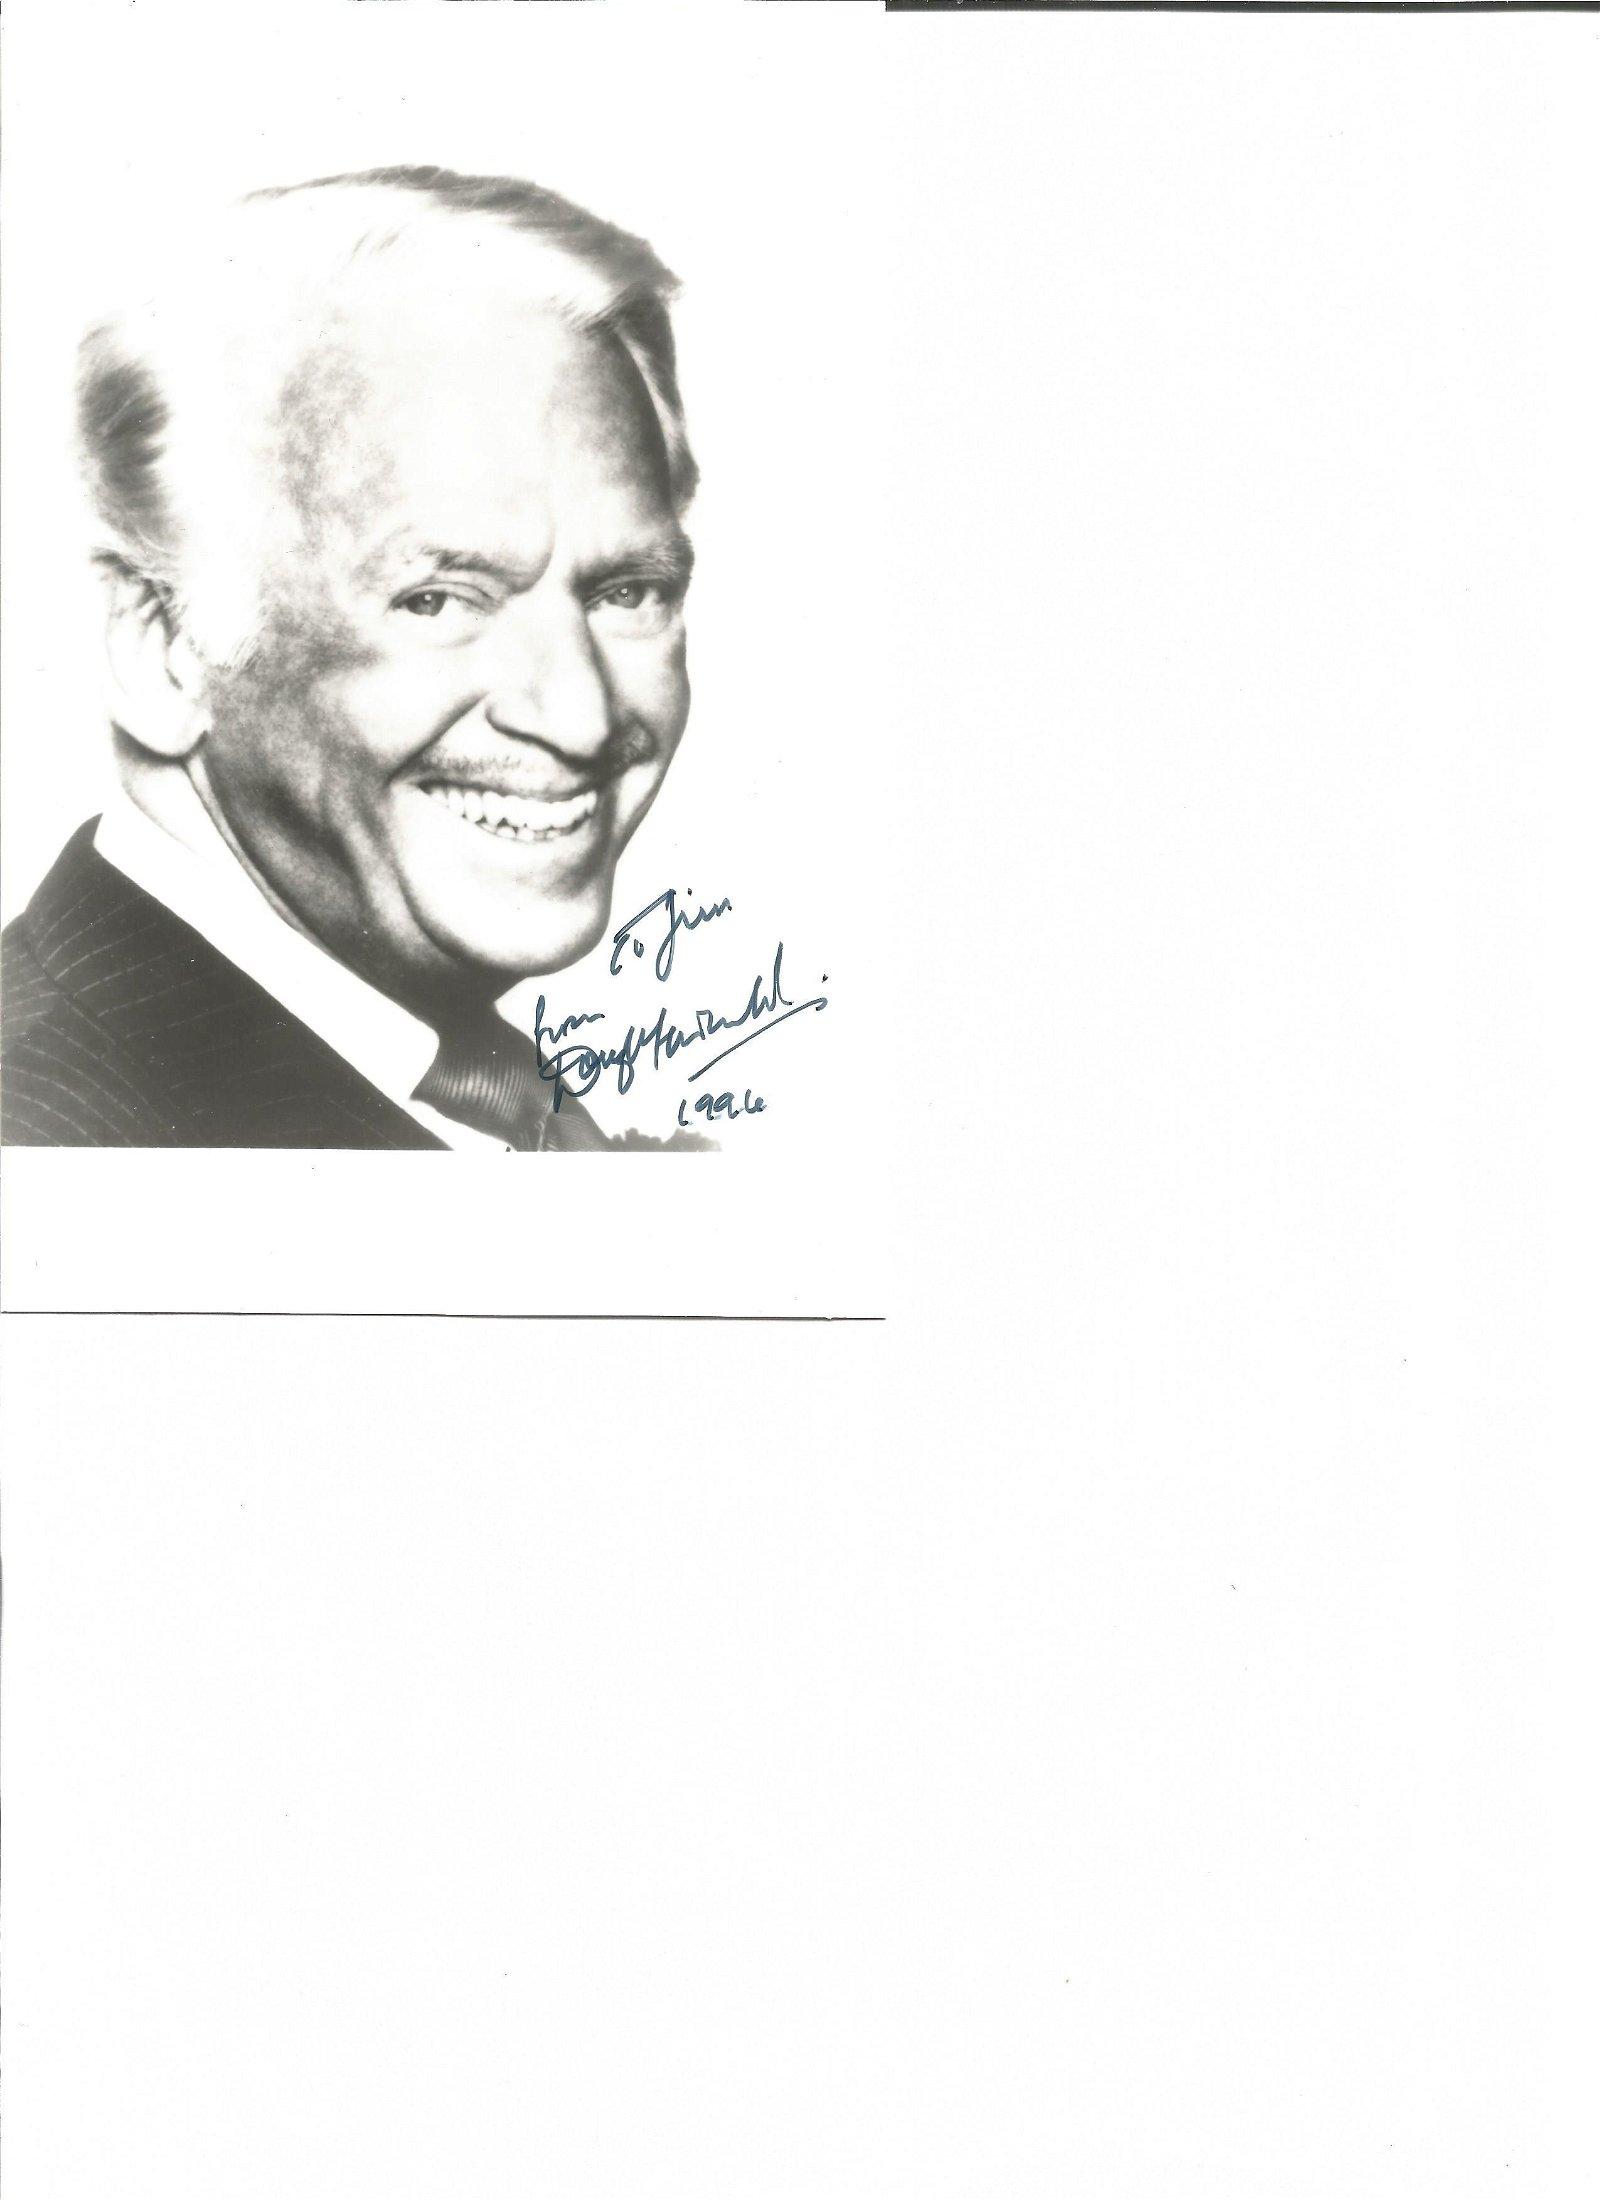 Douglas Fairbanks Jnr signed 7x5 black and white photo.